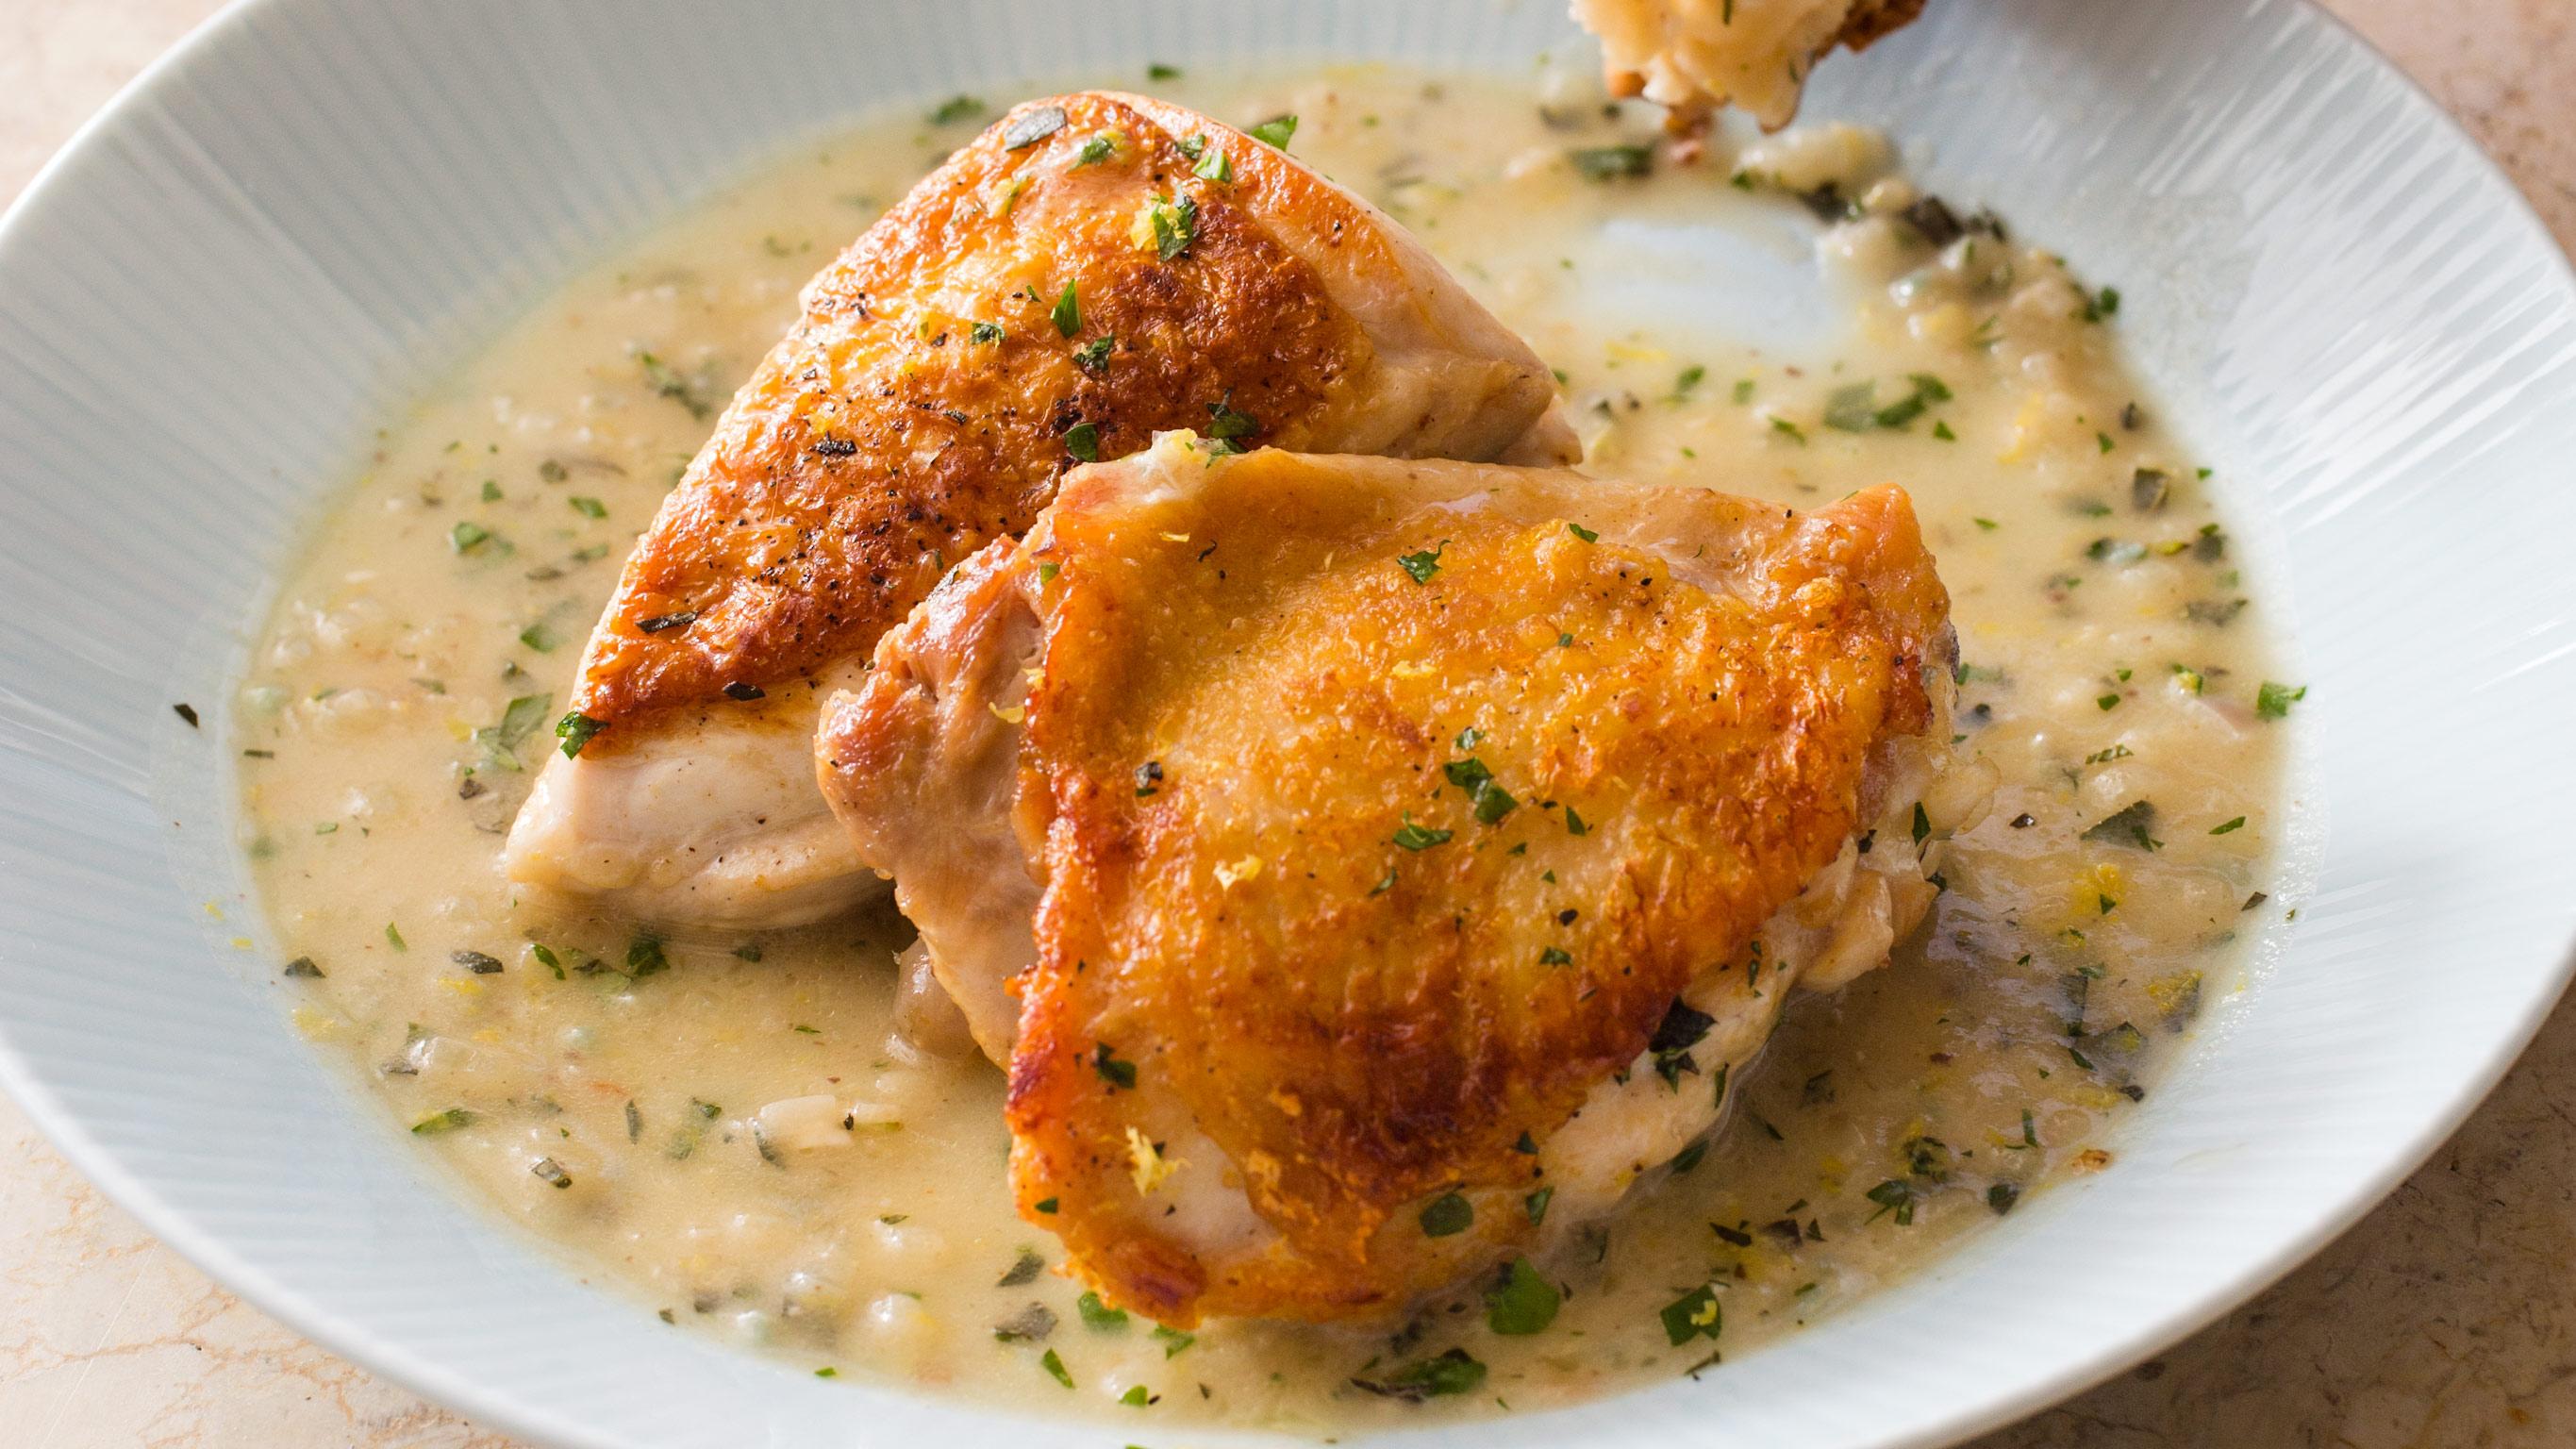 Skillet Roasted Chicken In Lemon Sauce America S Test Kitchen